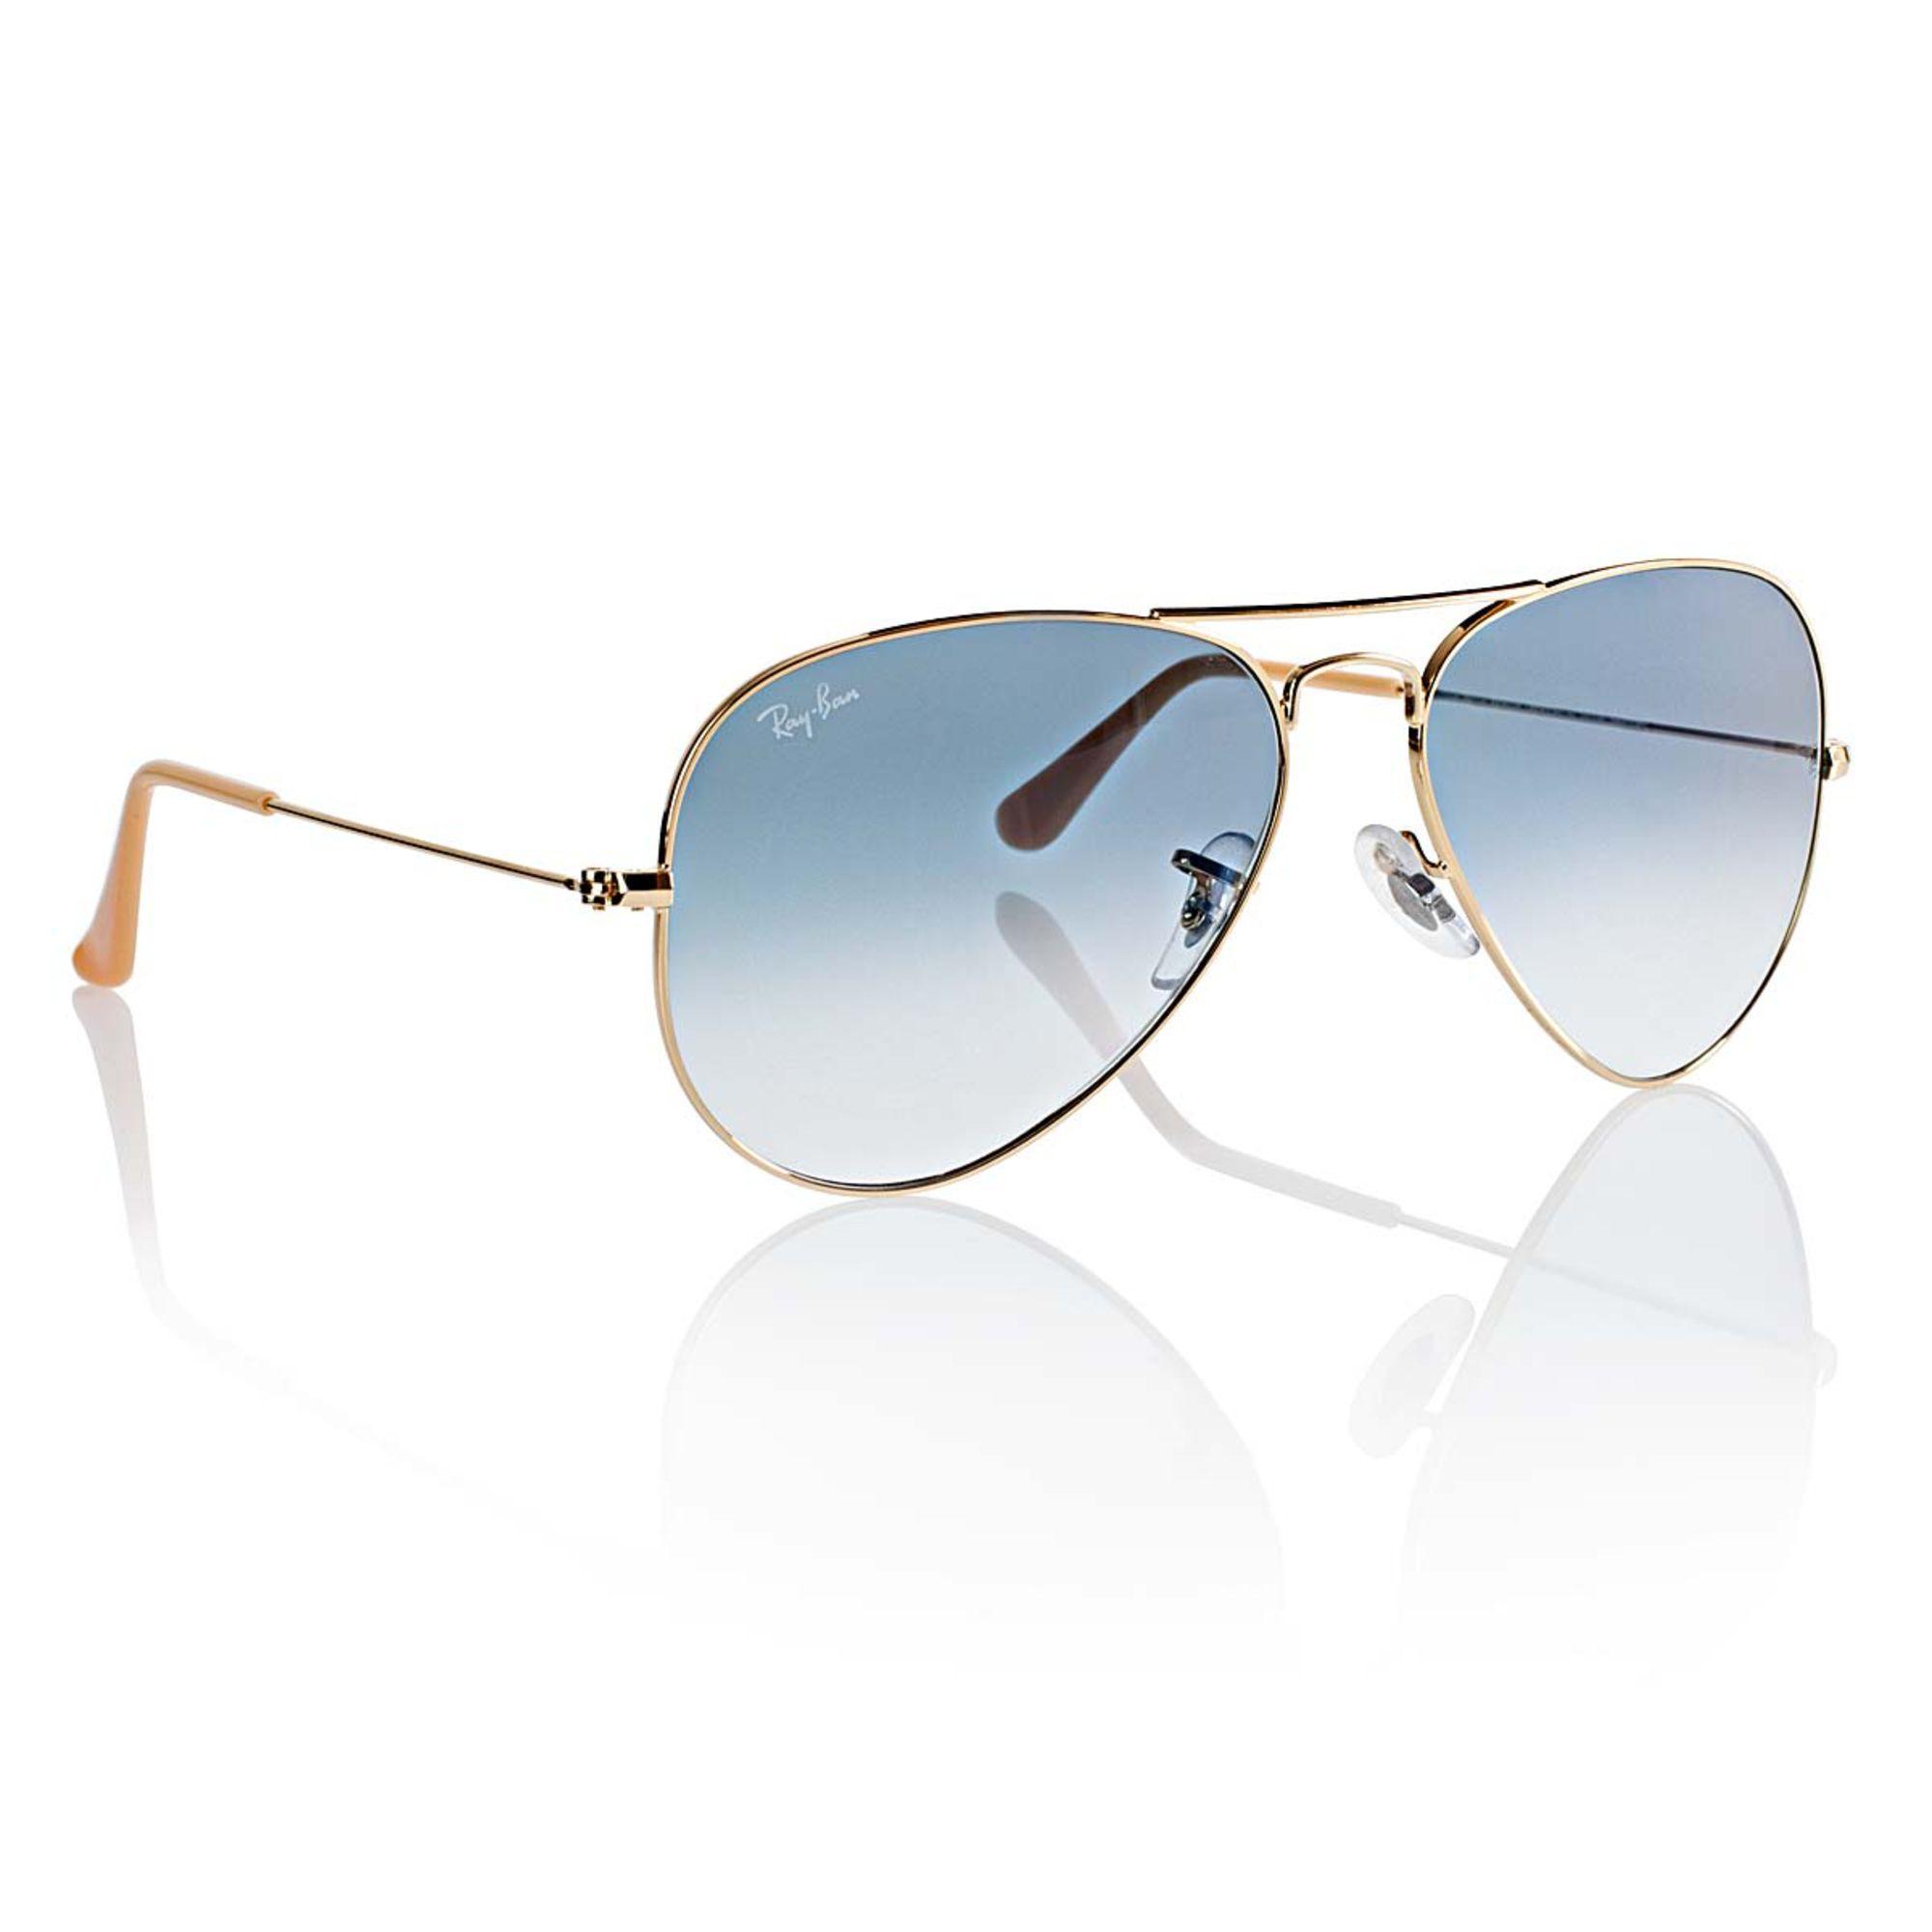 RAY-BAN Sonnenbrille | Sunglasses | Pinterest